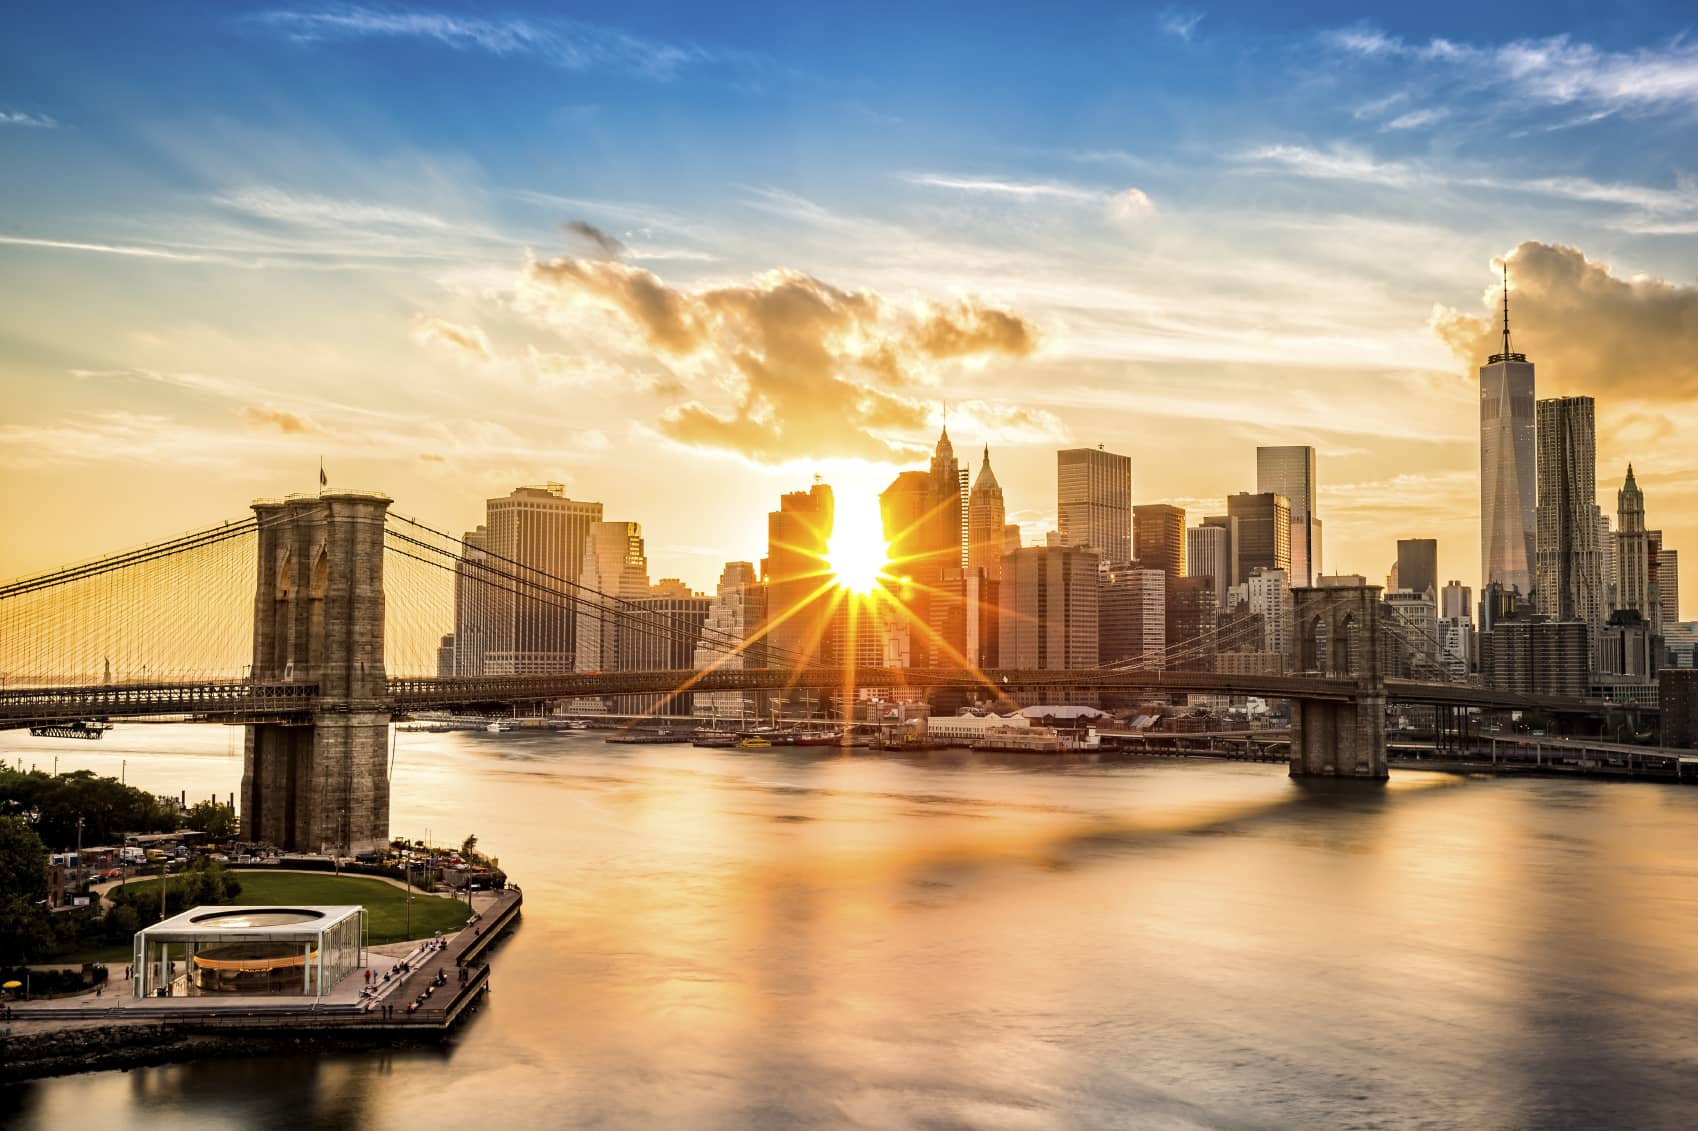 iStock_000067483275_Medium1 New York City Launches Community Solar Program